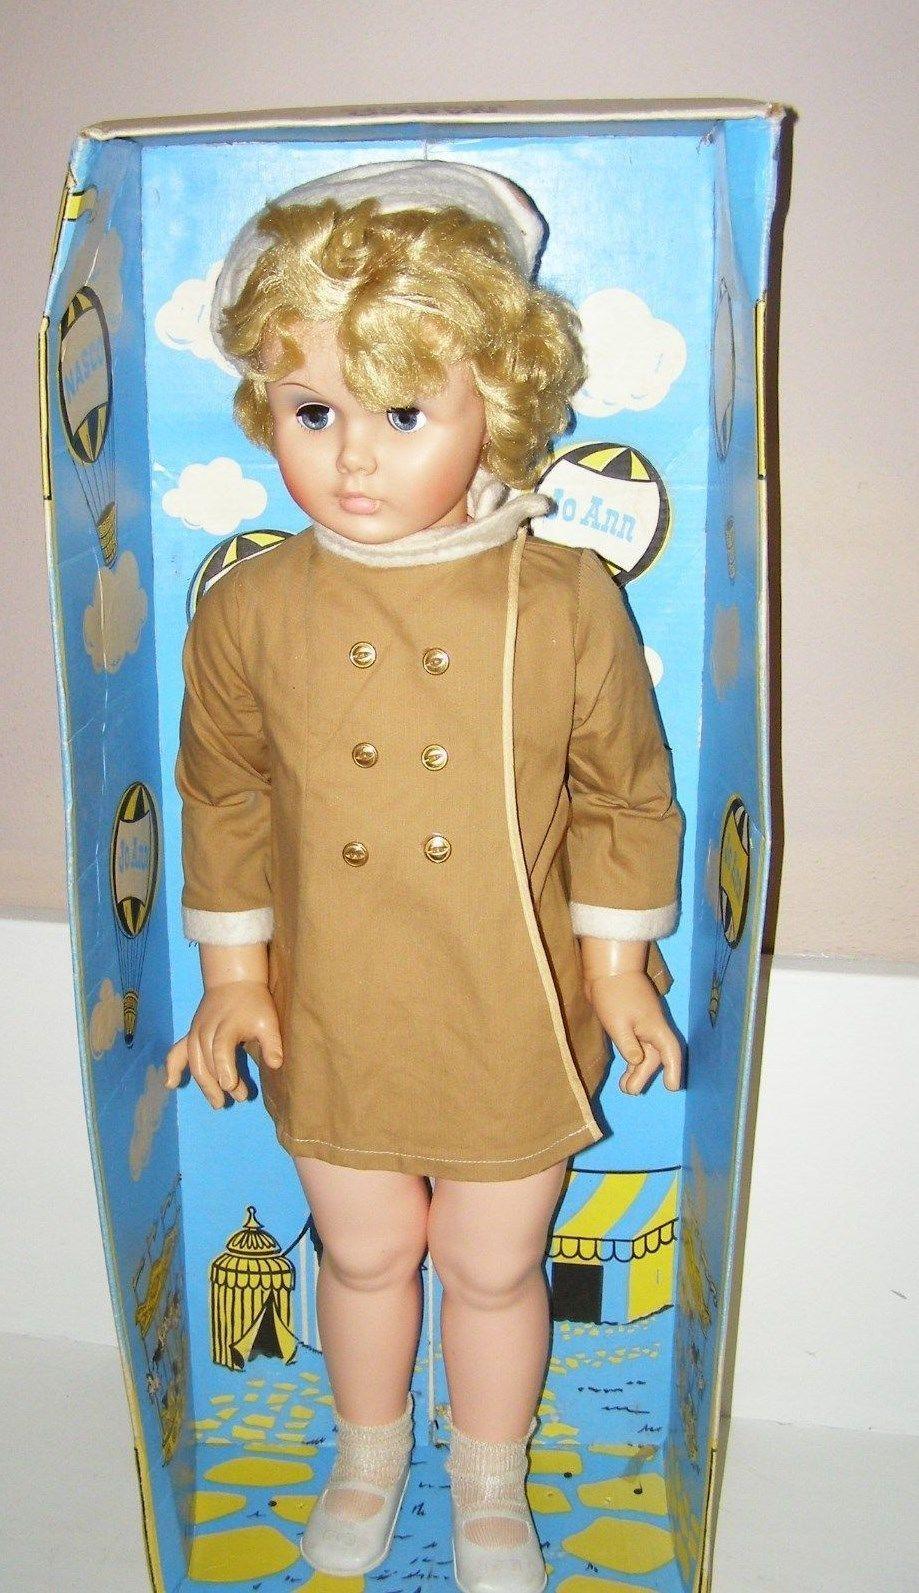 Vintage 36 Patty Playpal Like Walking Doll Joann 1968 Nasco W Box Ebay Dolls Old Dolls Baby Dolls